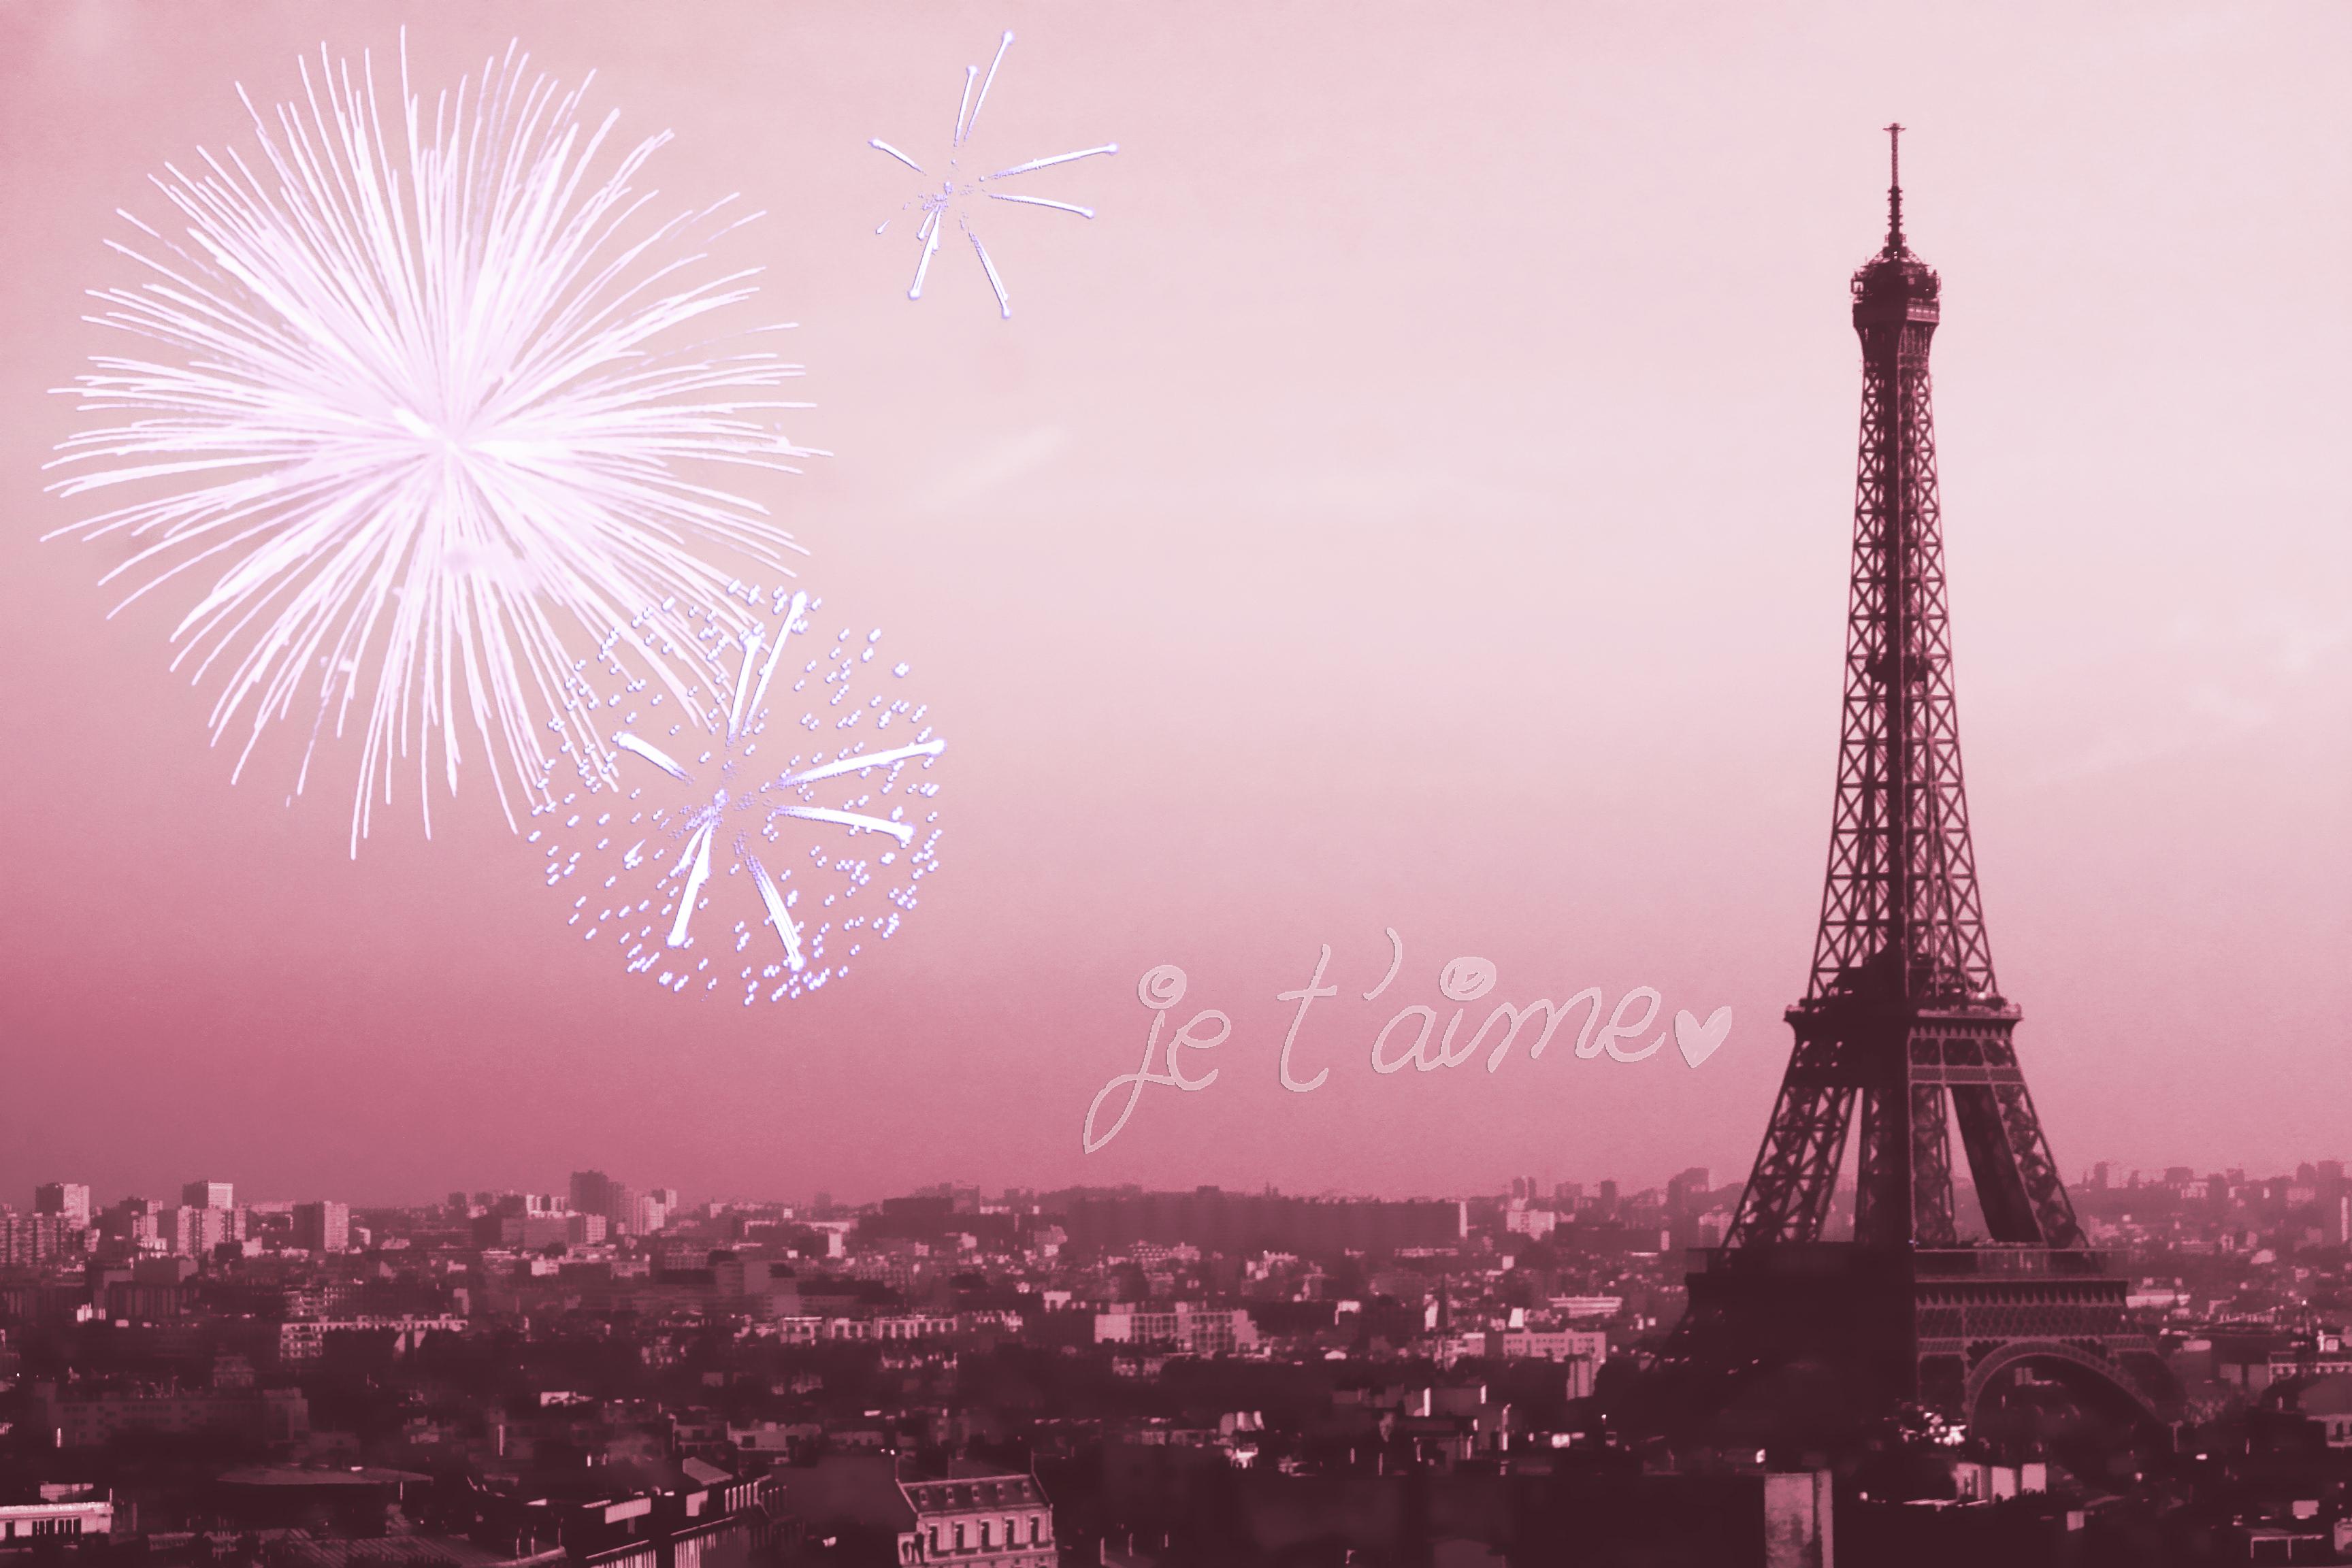 Paris Wallpaper by ScarlettBieber 3456x2304